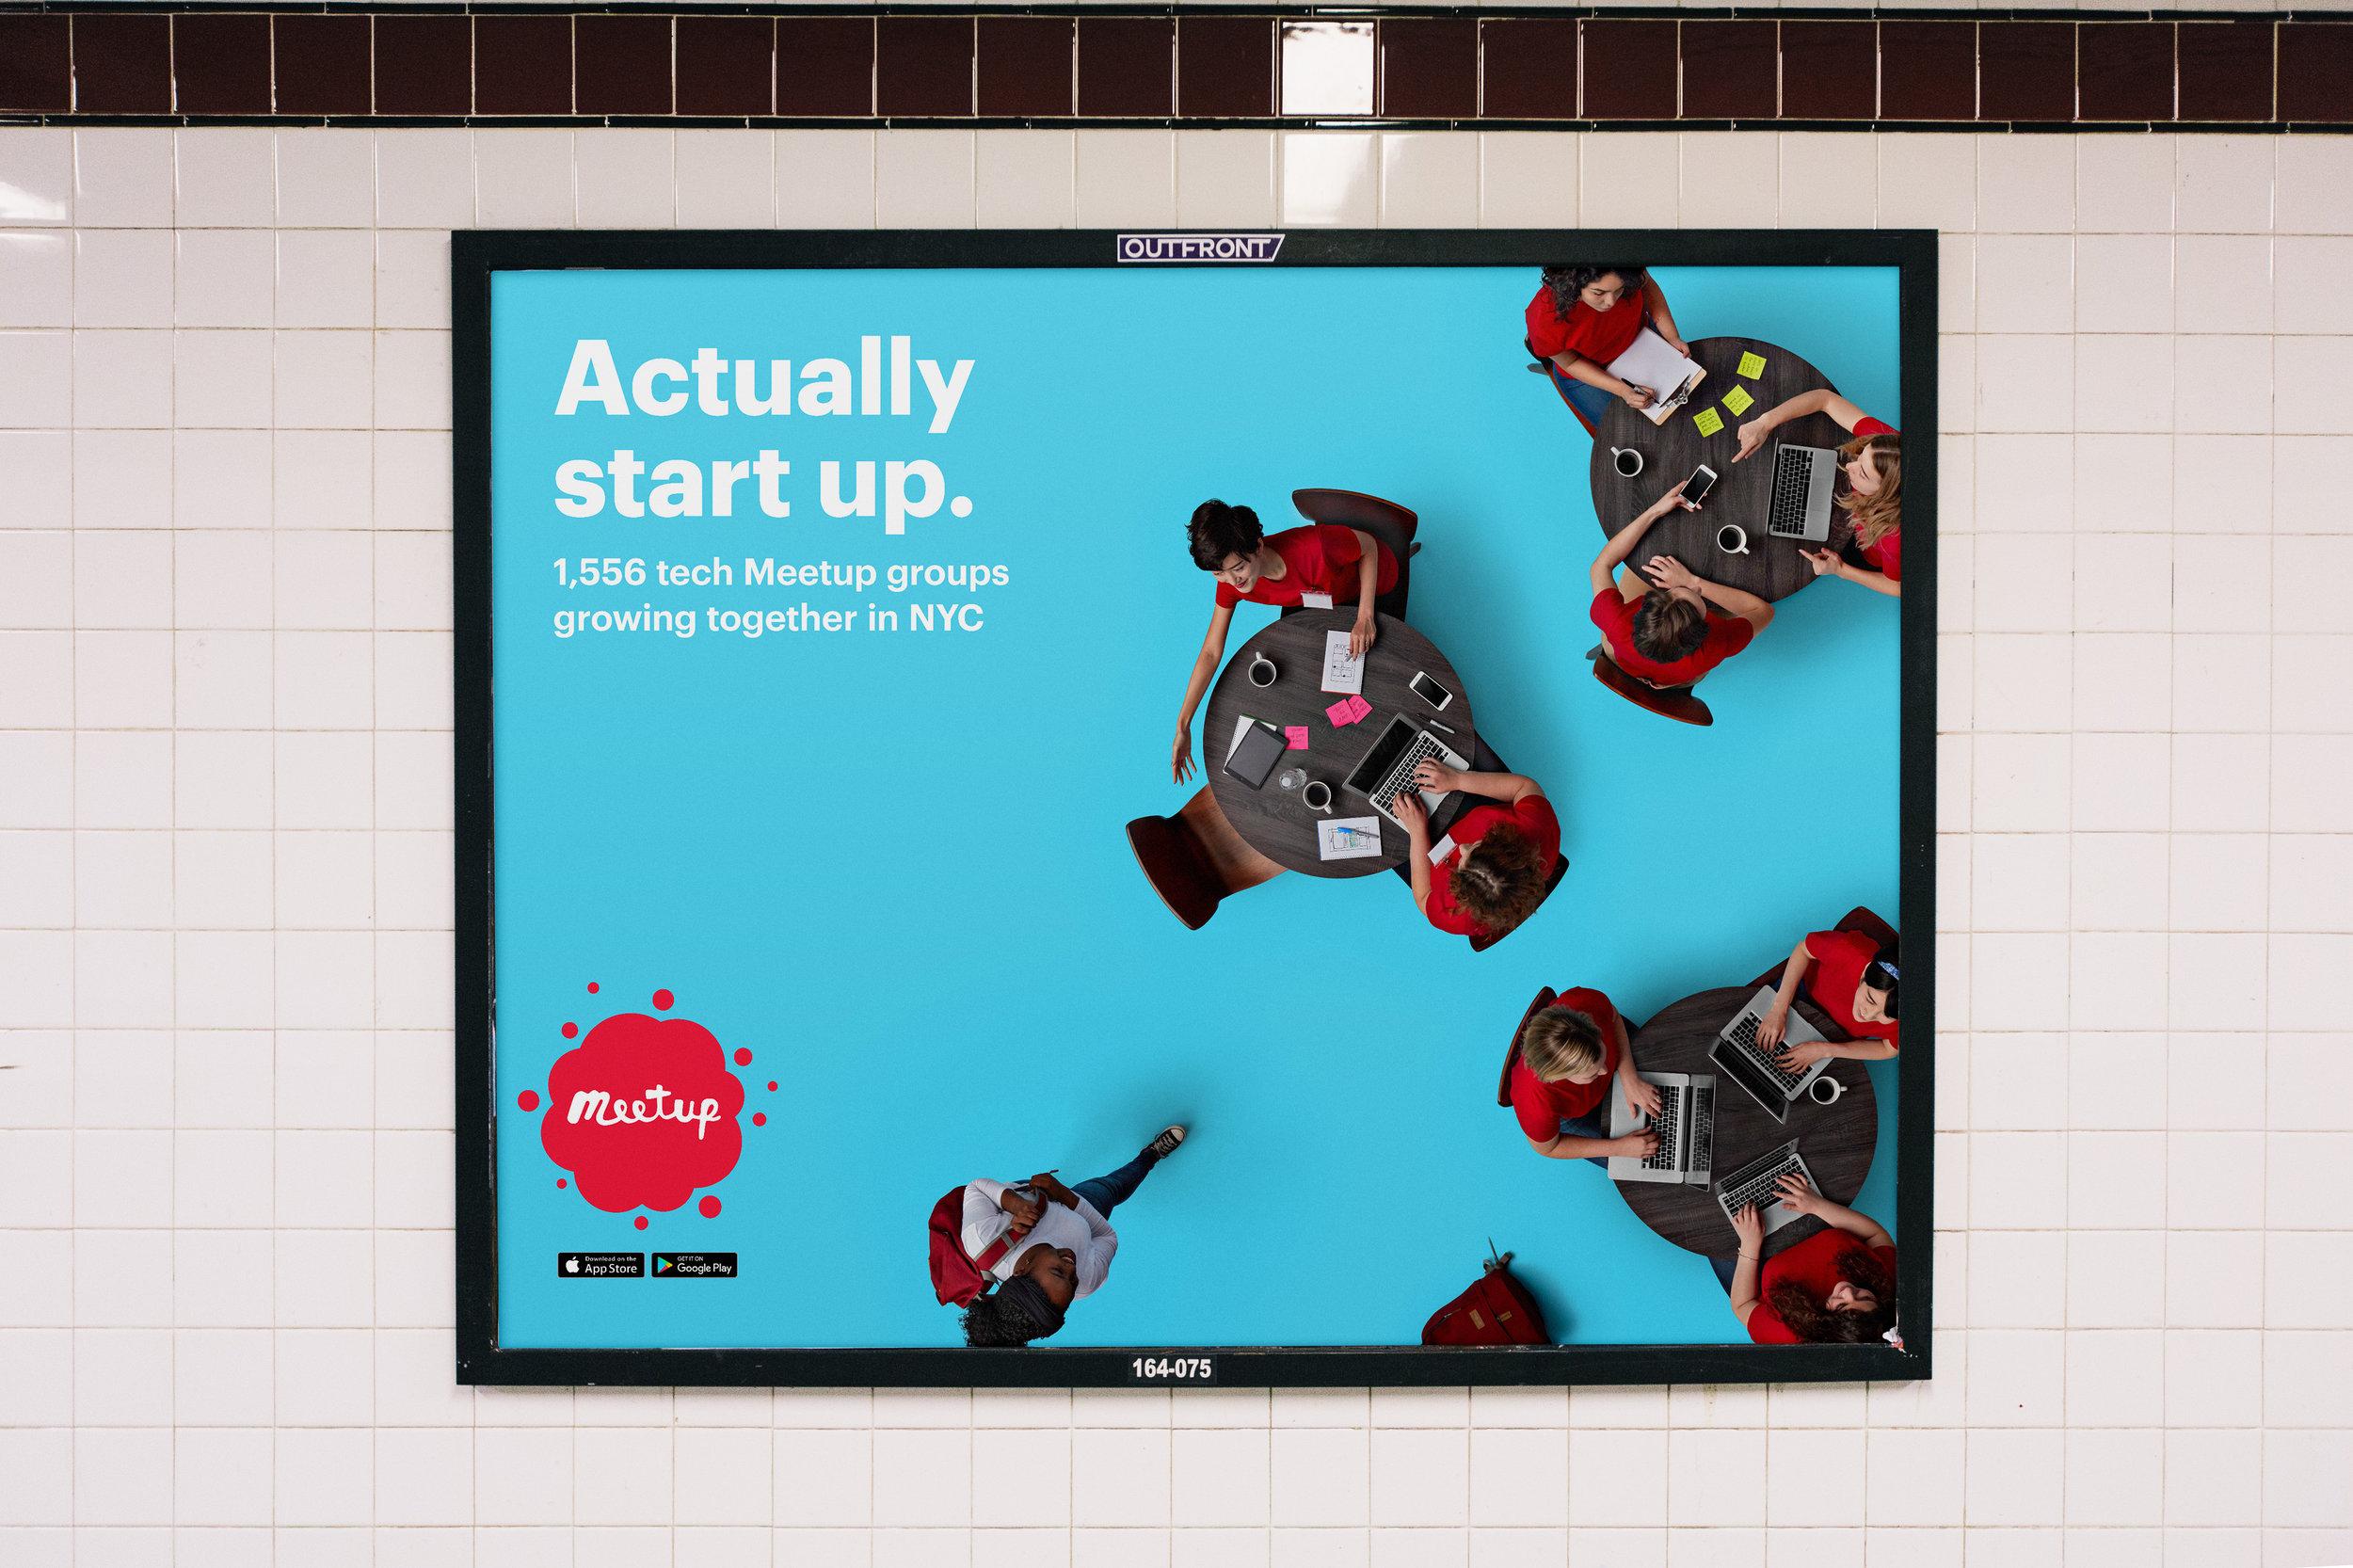 MeetUp_Subway_Ads_Posters_02.jpg